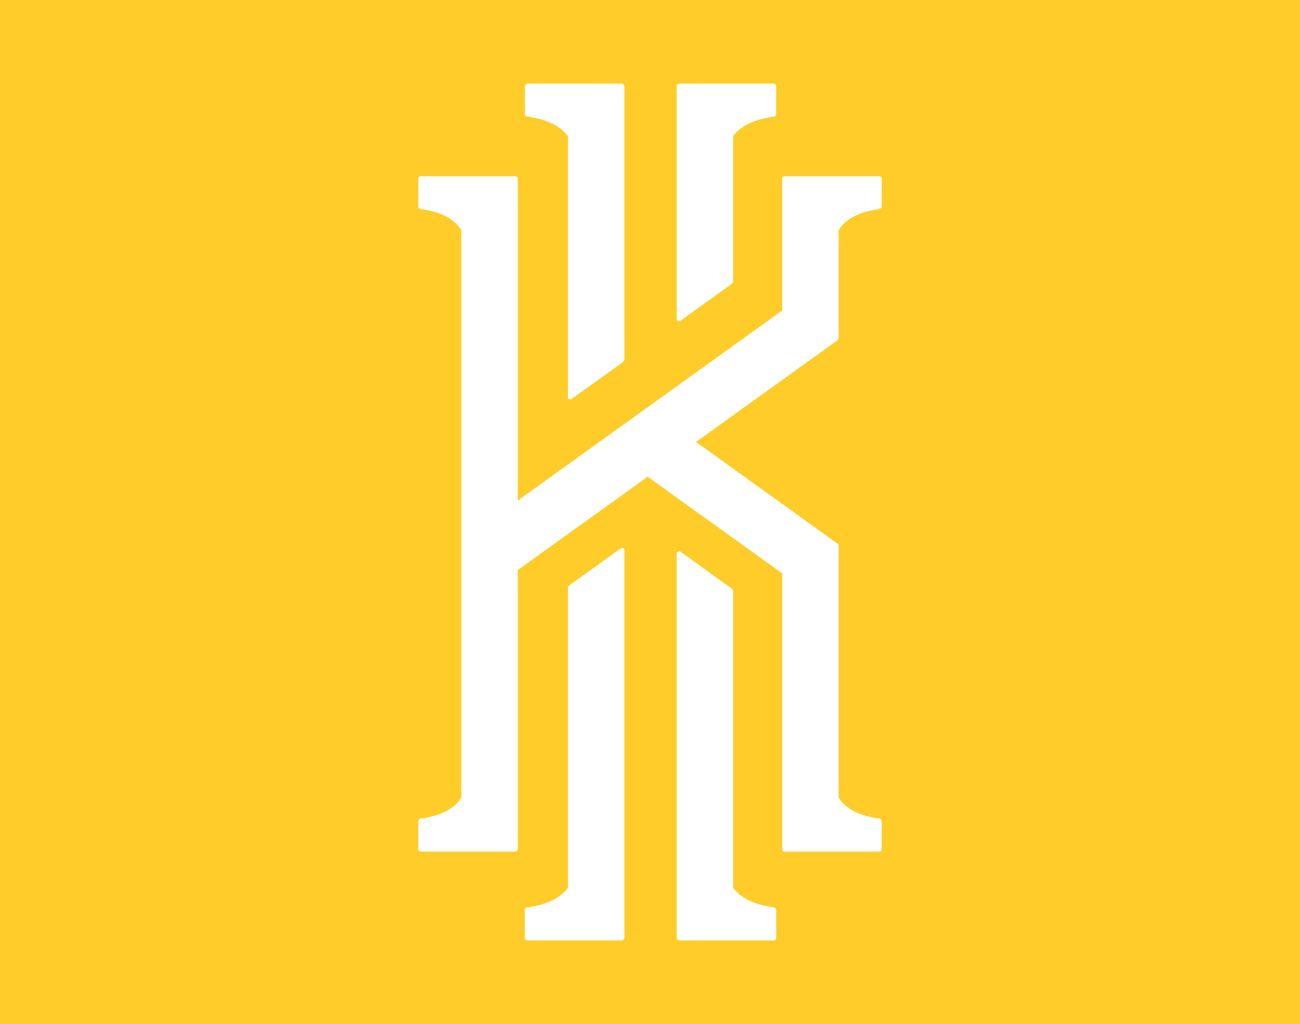 Font Kyrie Irving Logo | Kyrie irving